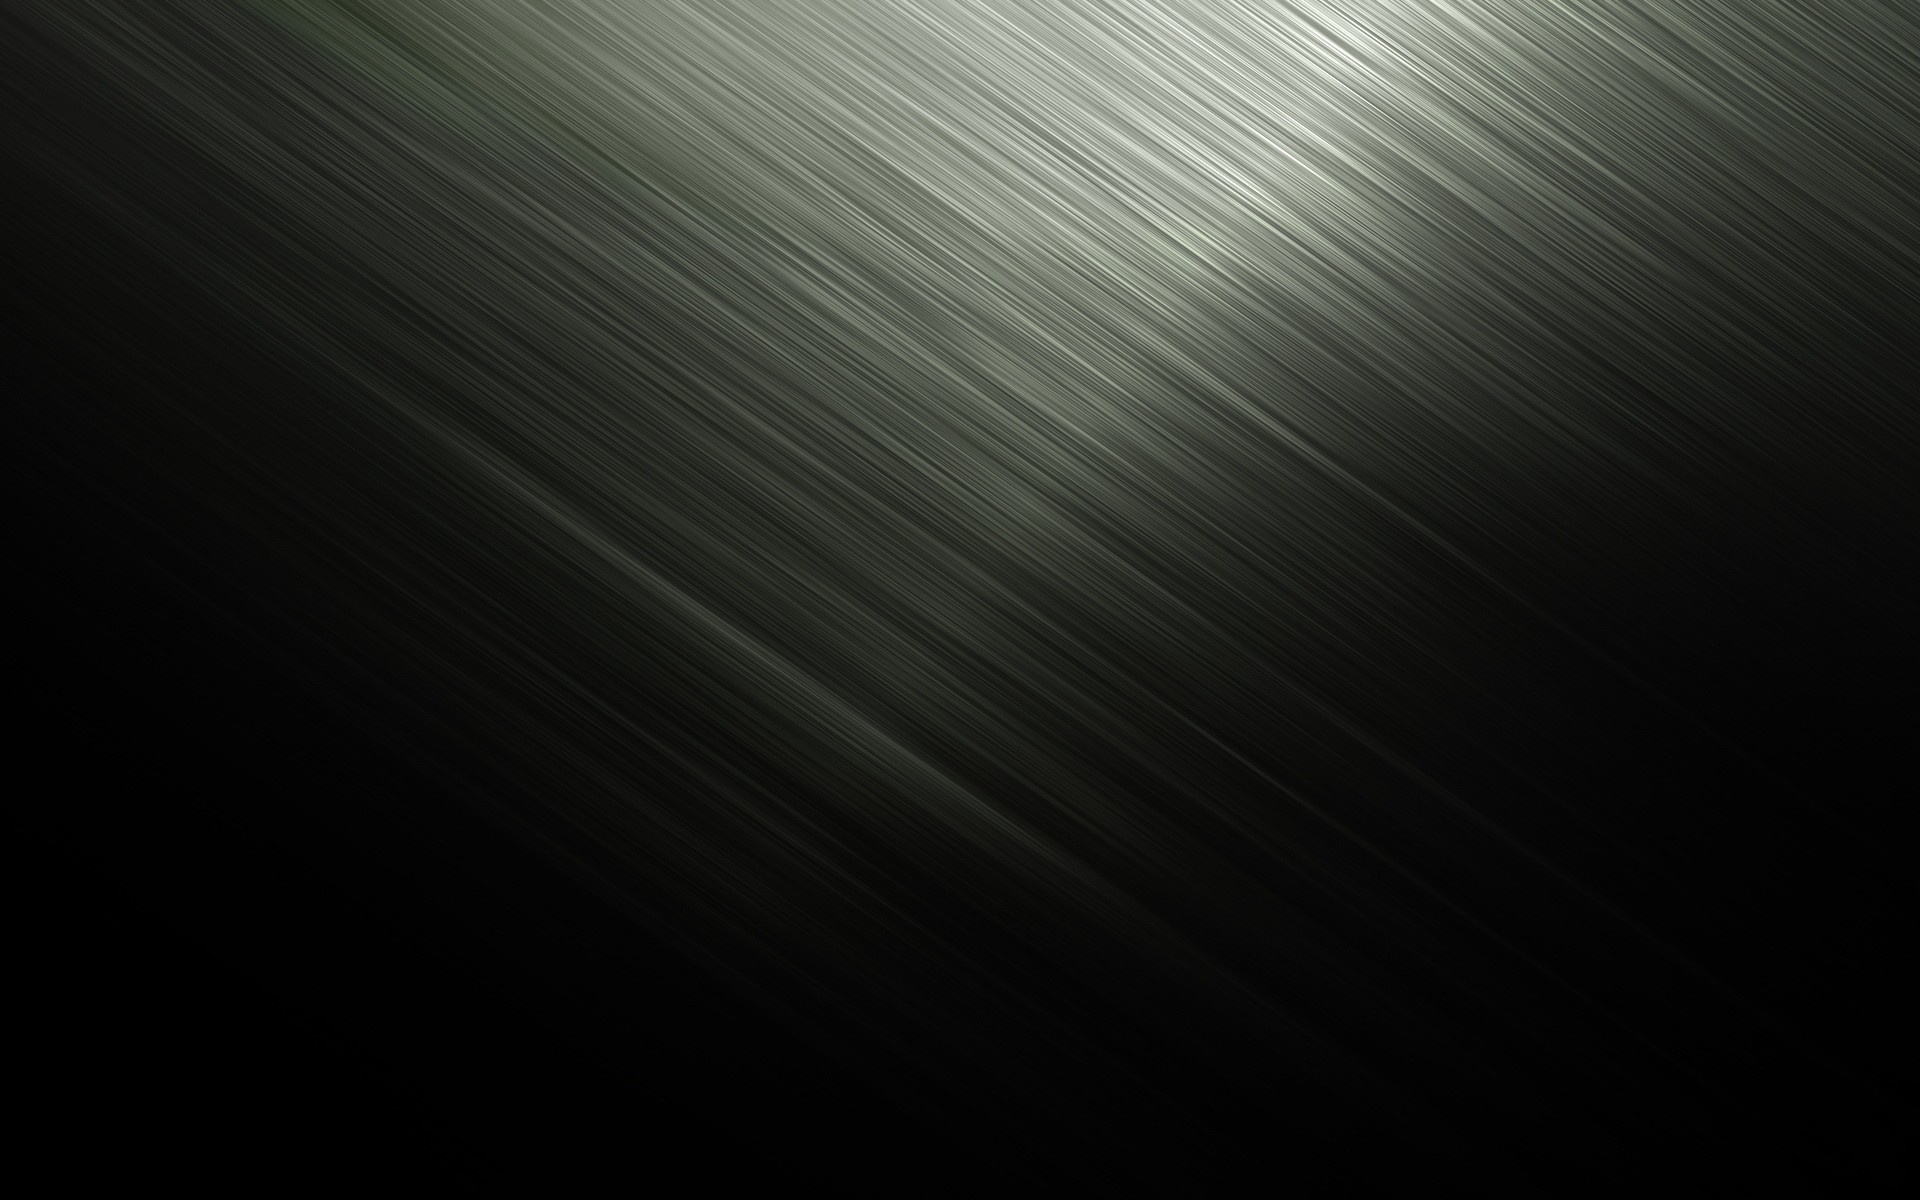 Abstract Black Wallpaper Abstract, Black